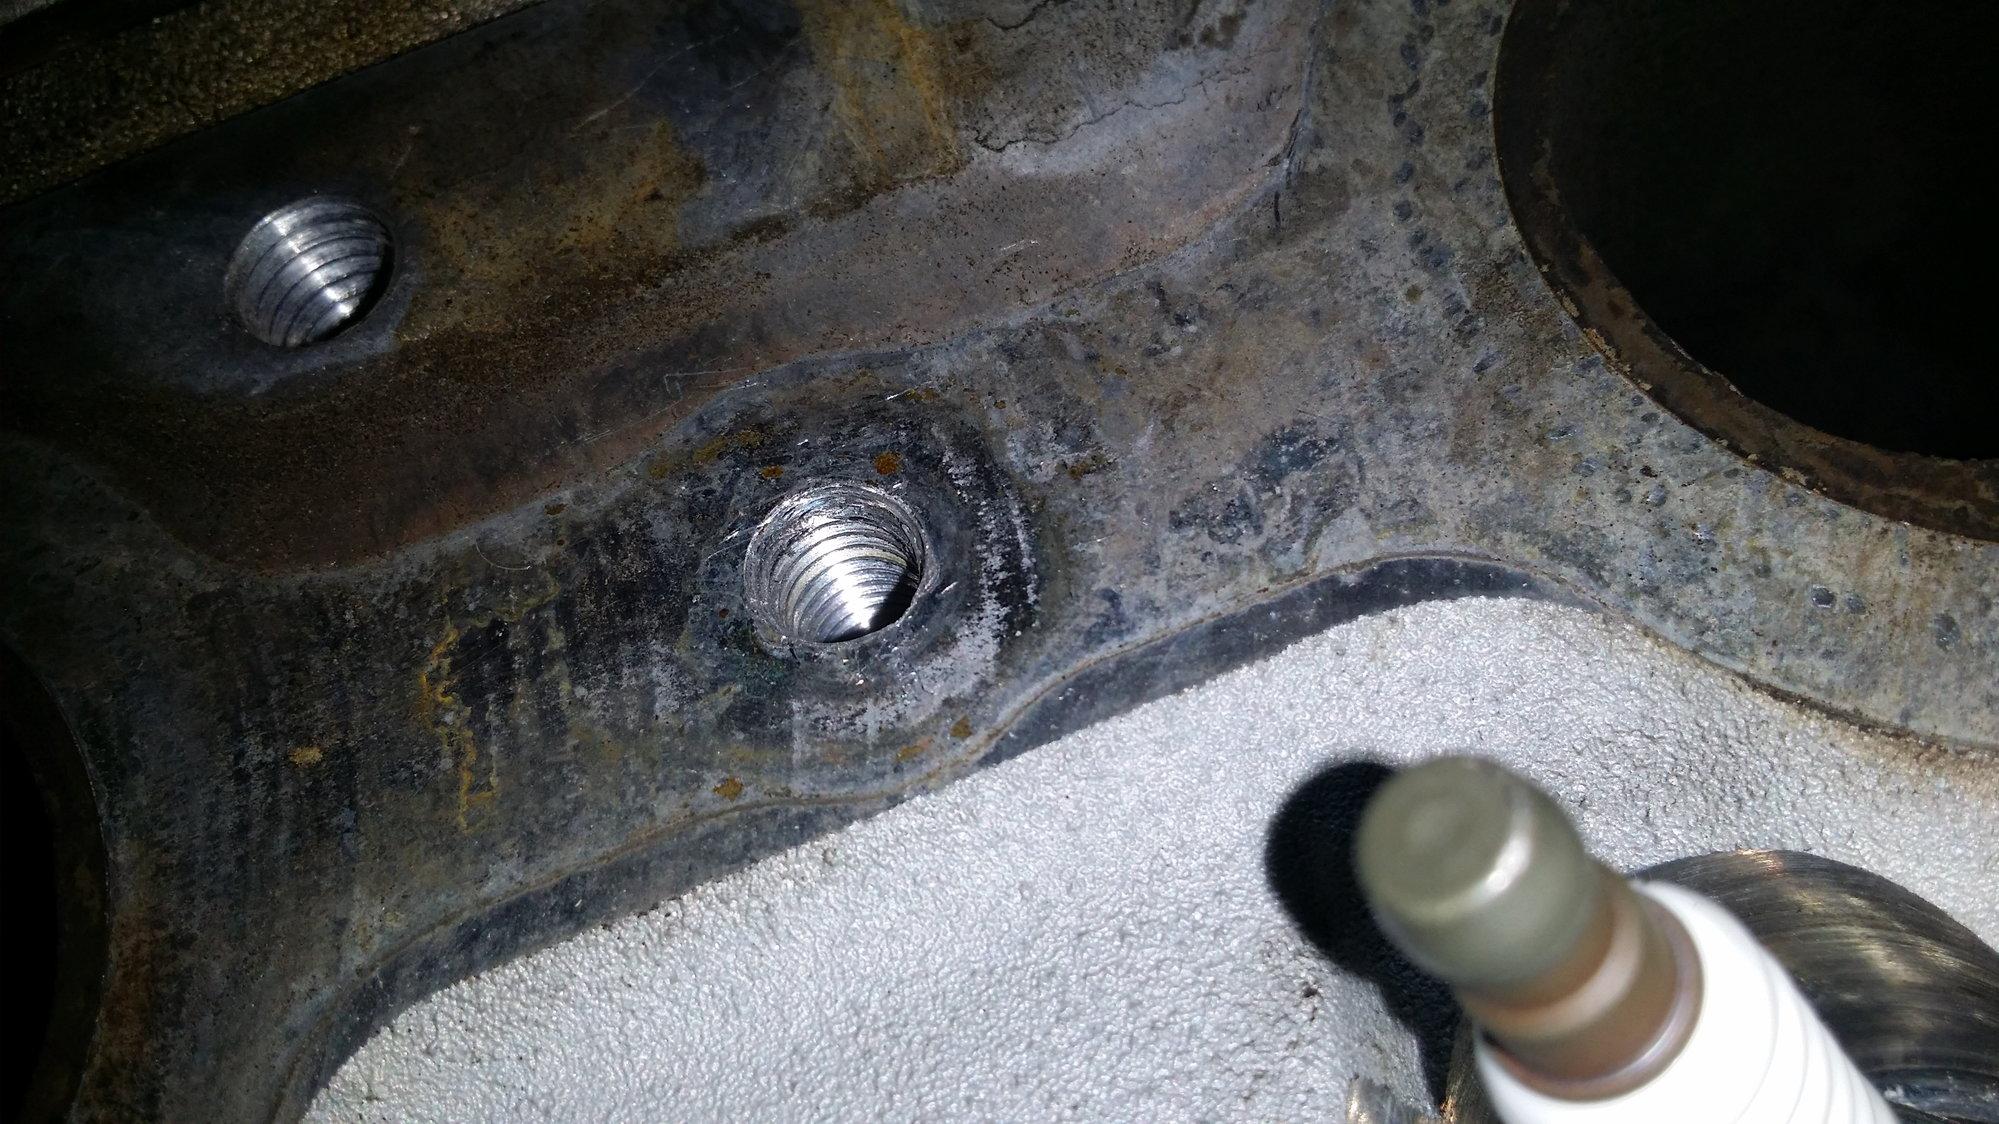 cross threaded exhaust manifold bolts